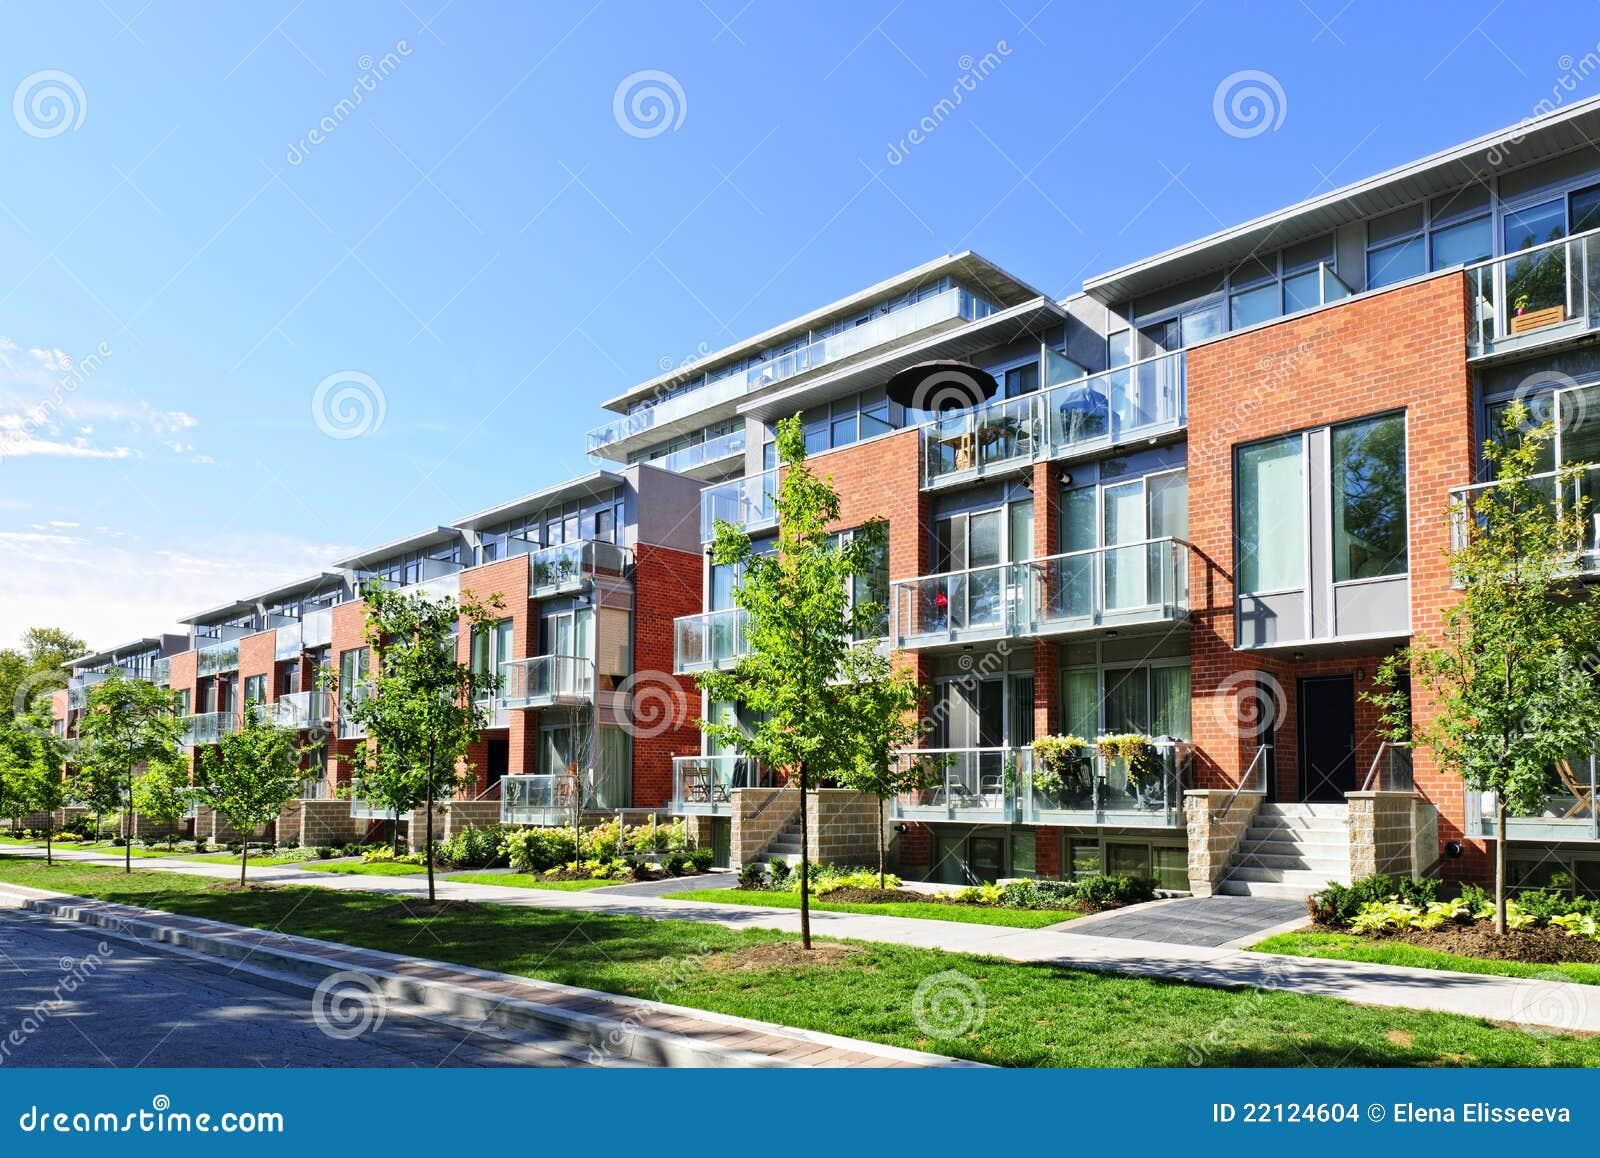 Immagini di case moderne progetti di ville moderne foto - Foto di case moderne ...